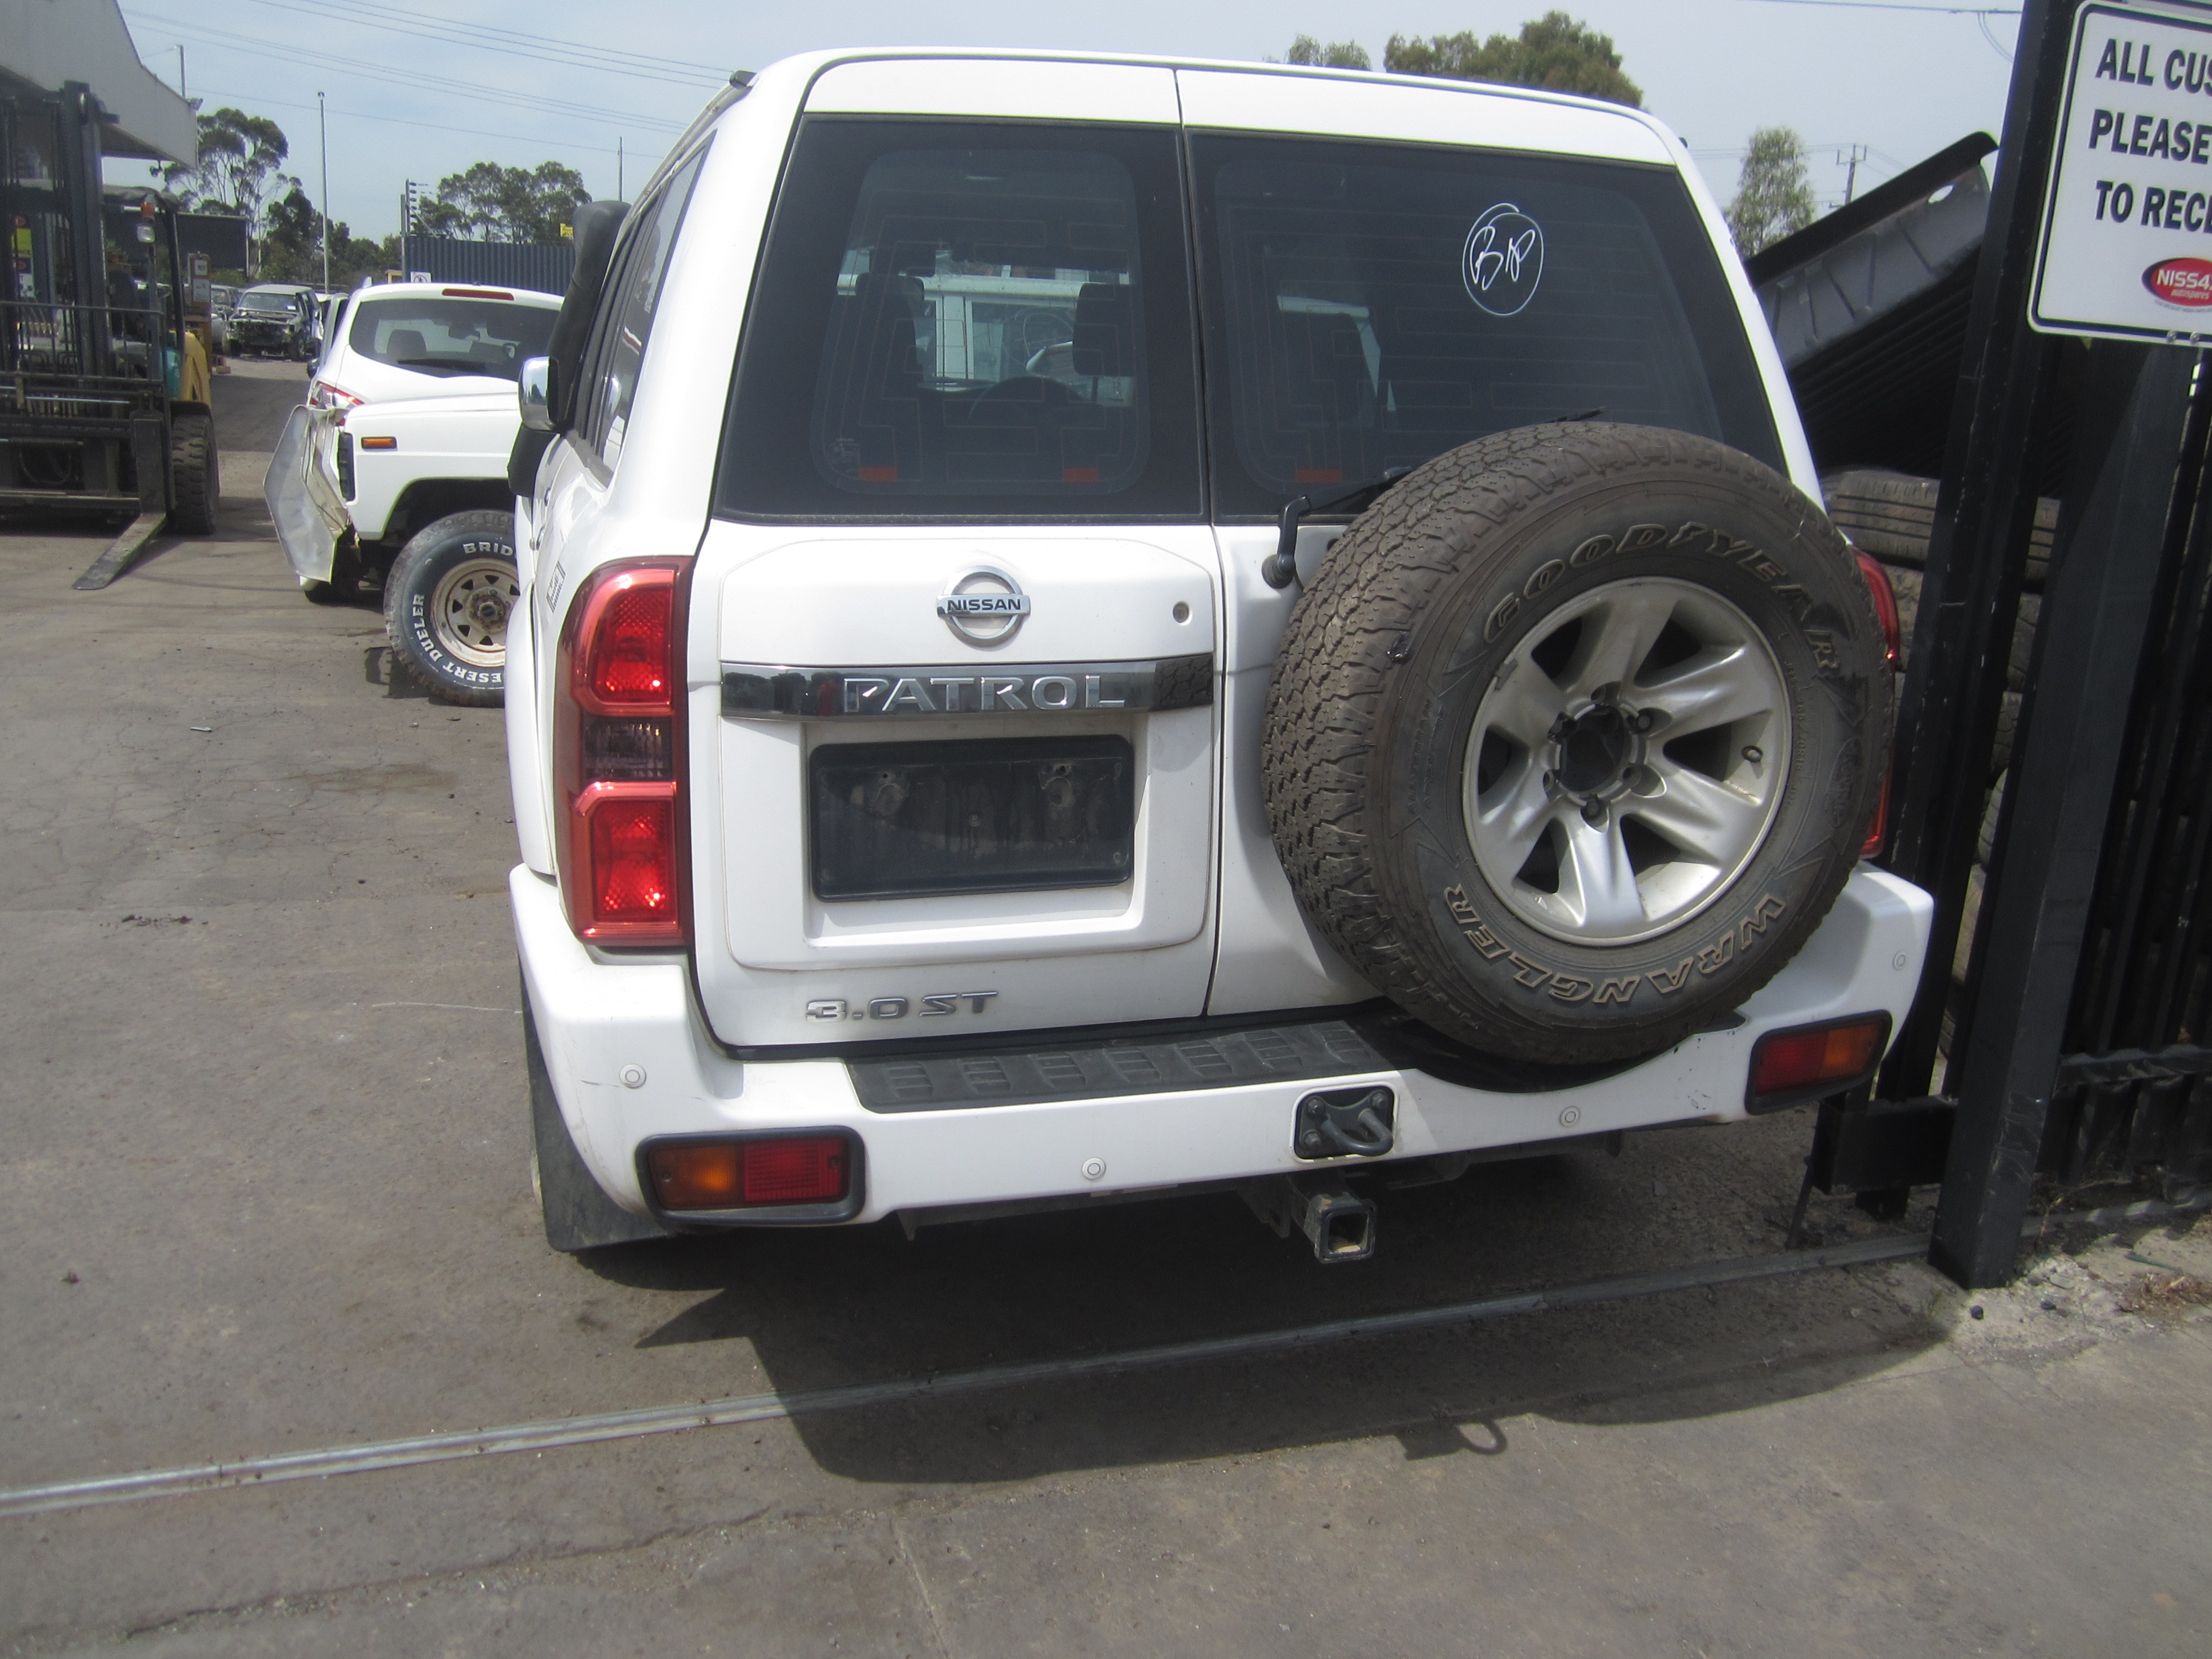 nissan patrol y61 gu st wagon zd30 turbo diesel 2012 wrecking. Black Bedroom Furniture Sets. Home Design Ideas